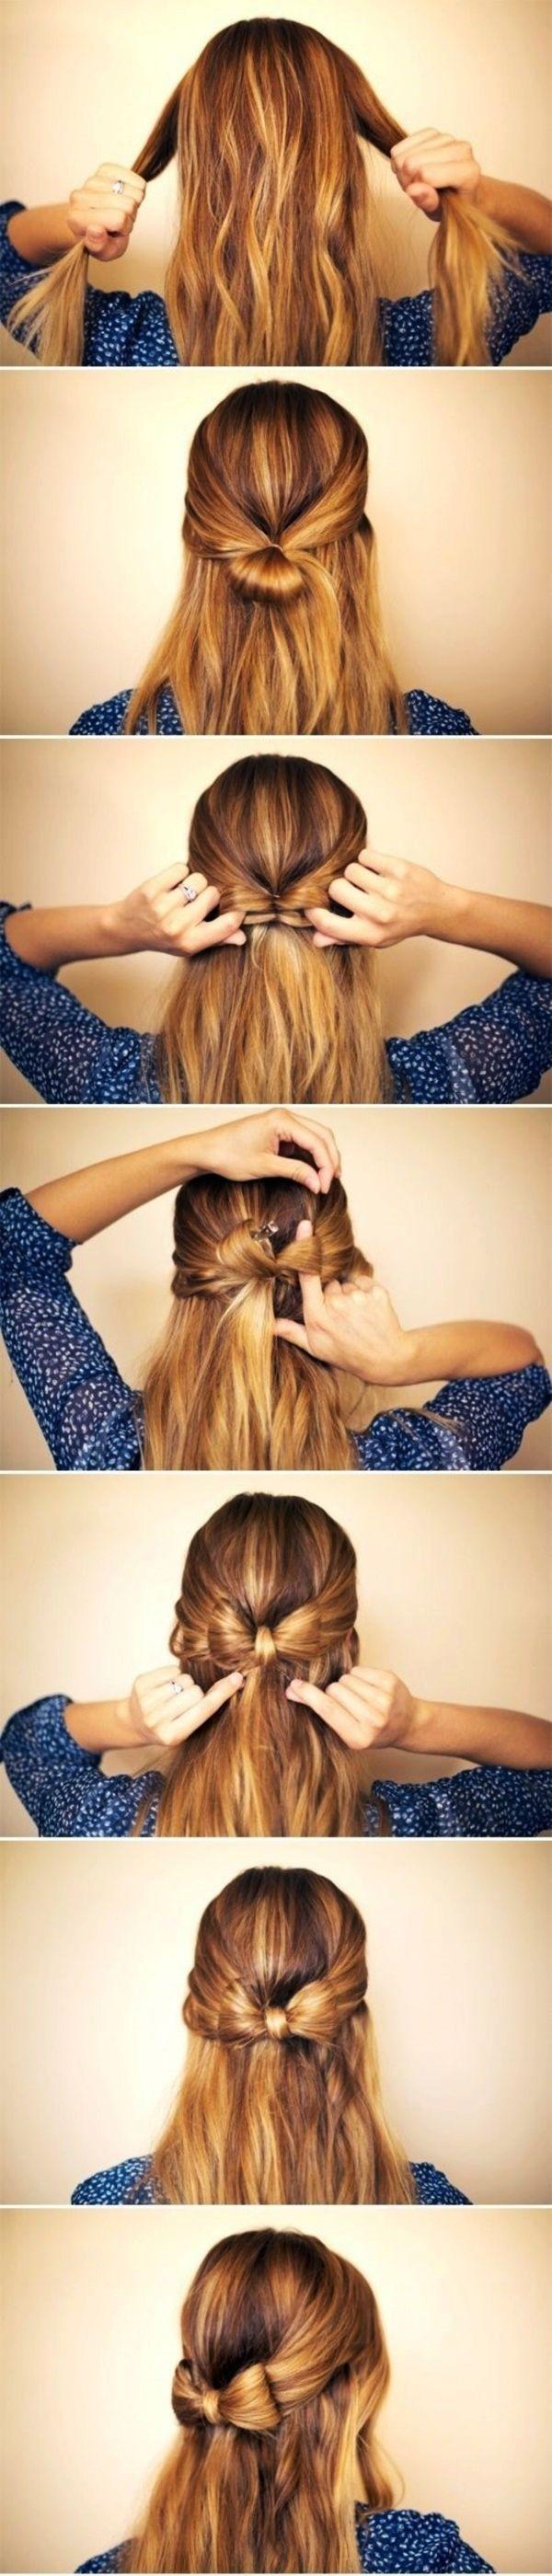 Easy DIY Hairstyles for Medium and Long Hair1 (93)